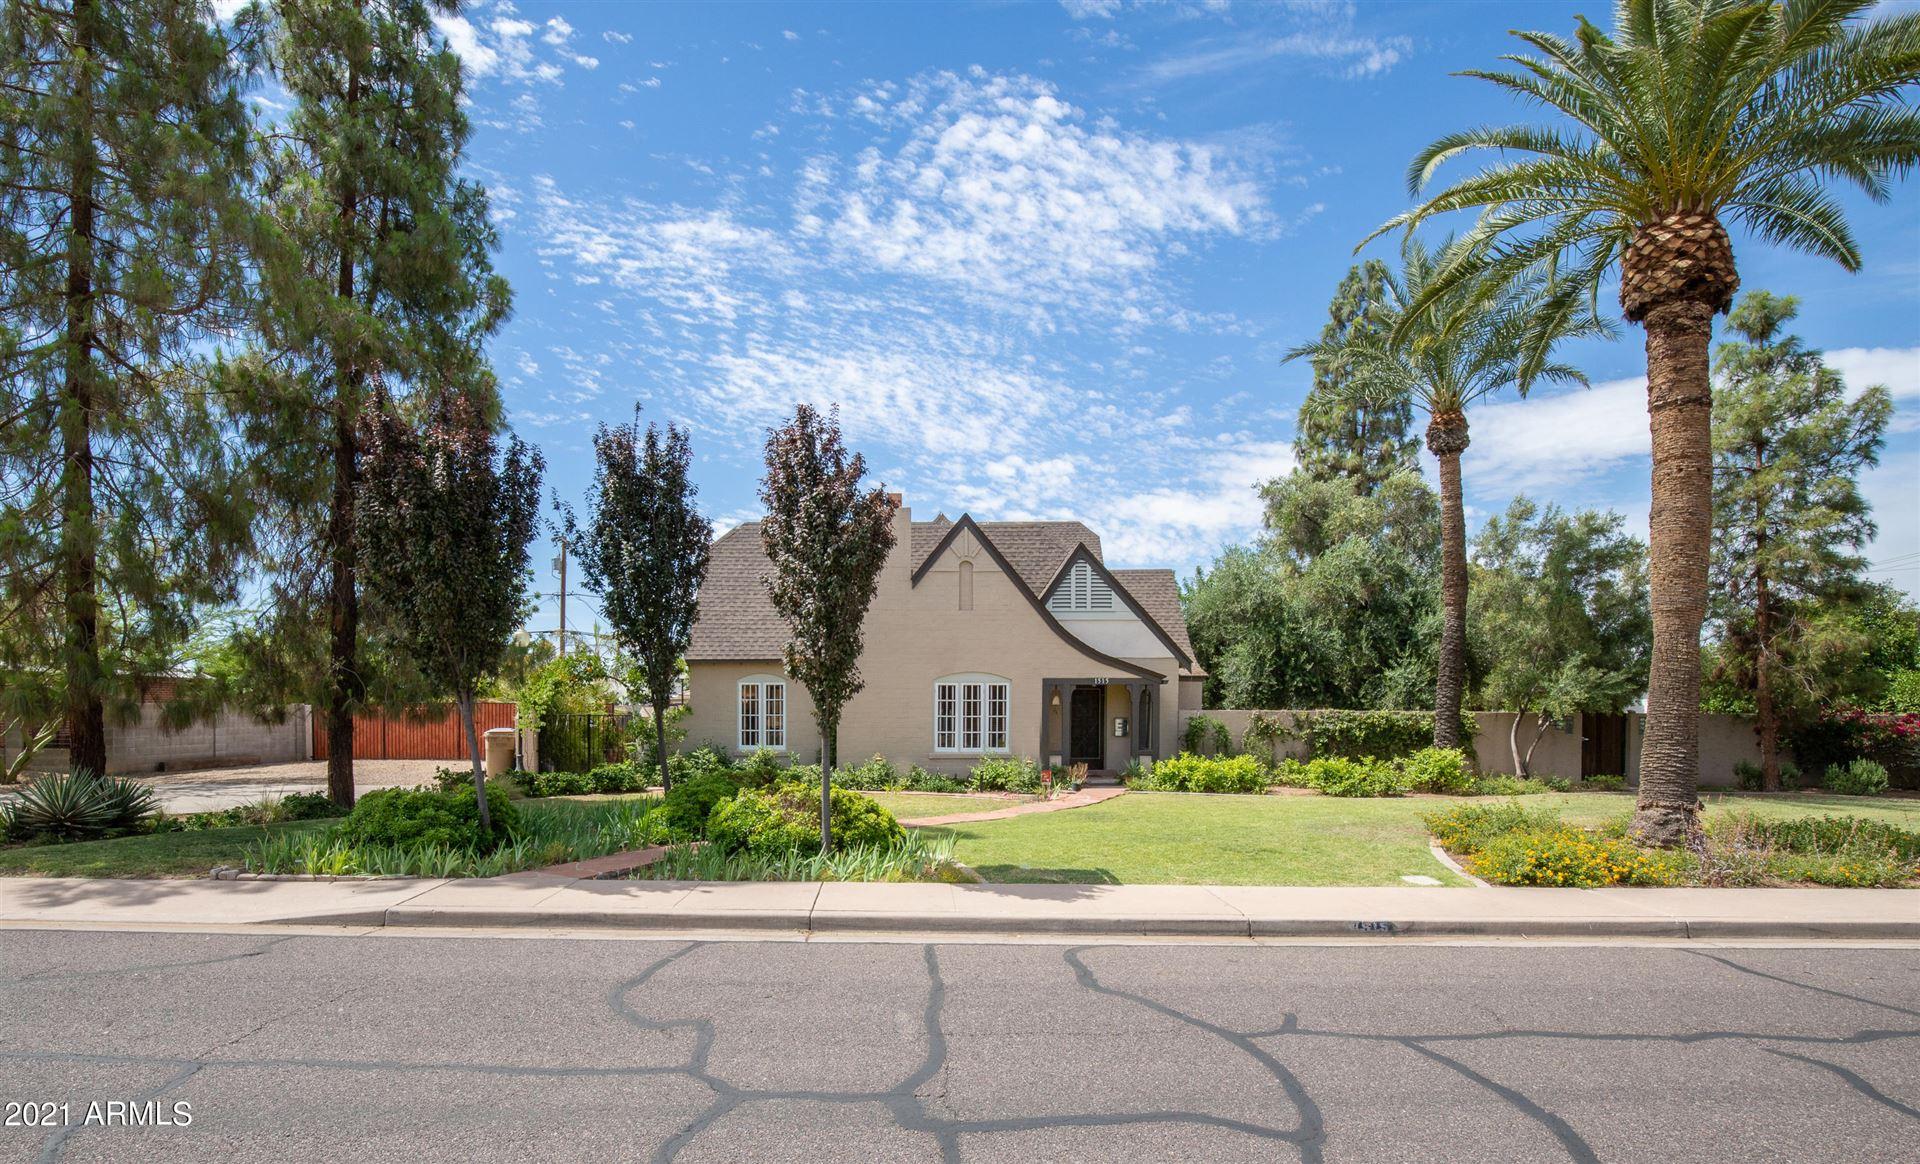 Photo of 1505 E CORONADO Road, Phoenix, AZ 85006 (MLS # 6250078)